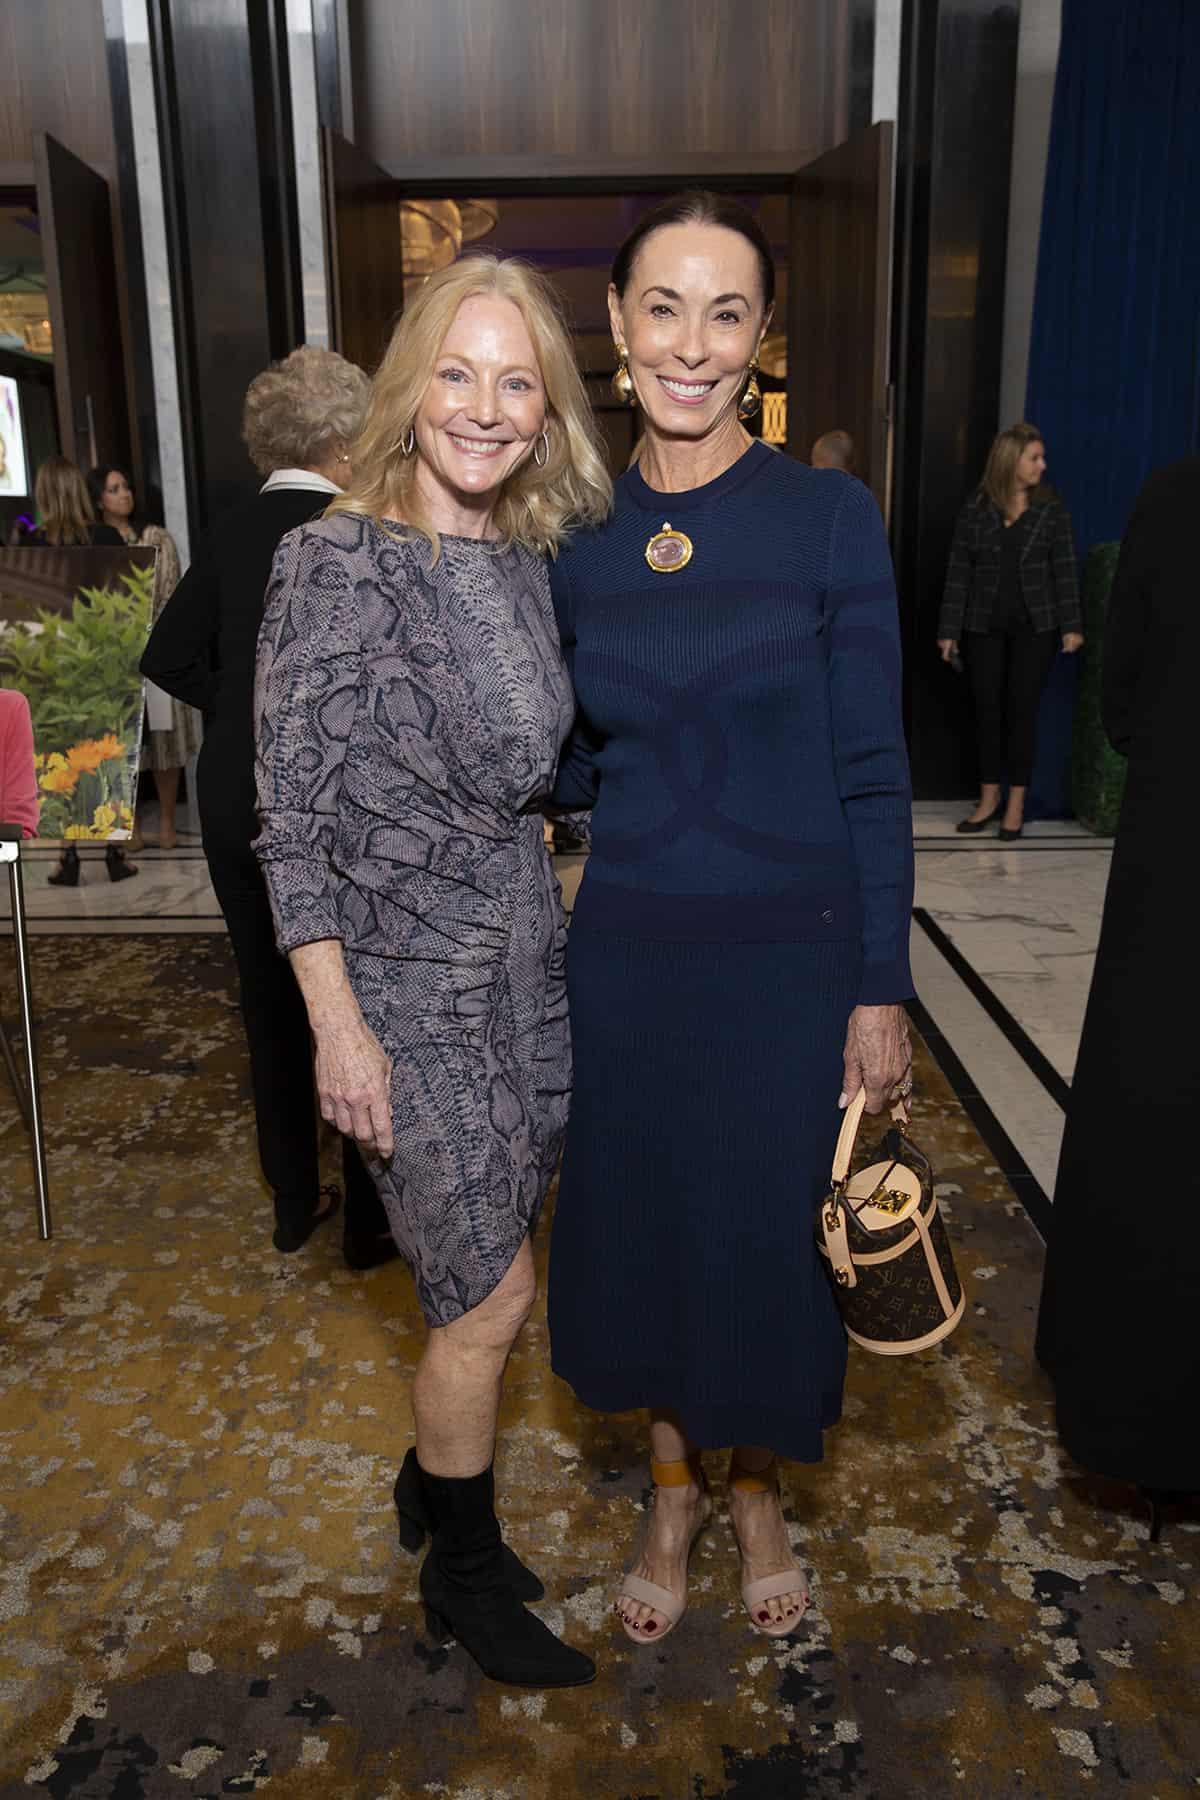 Trish Morille and Sue Smith